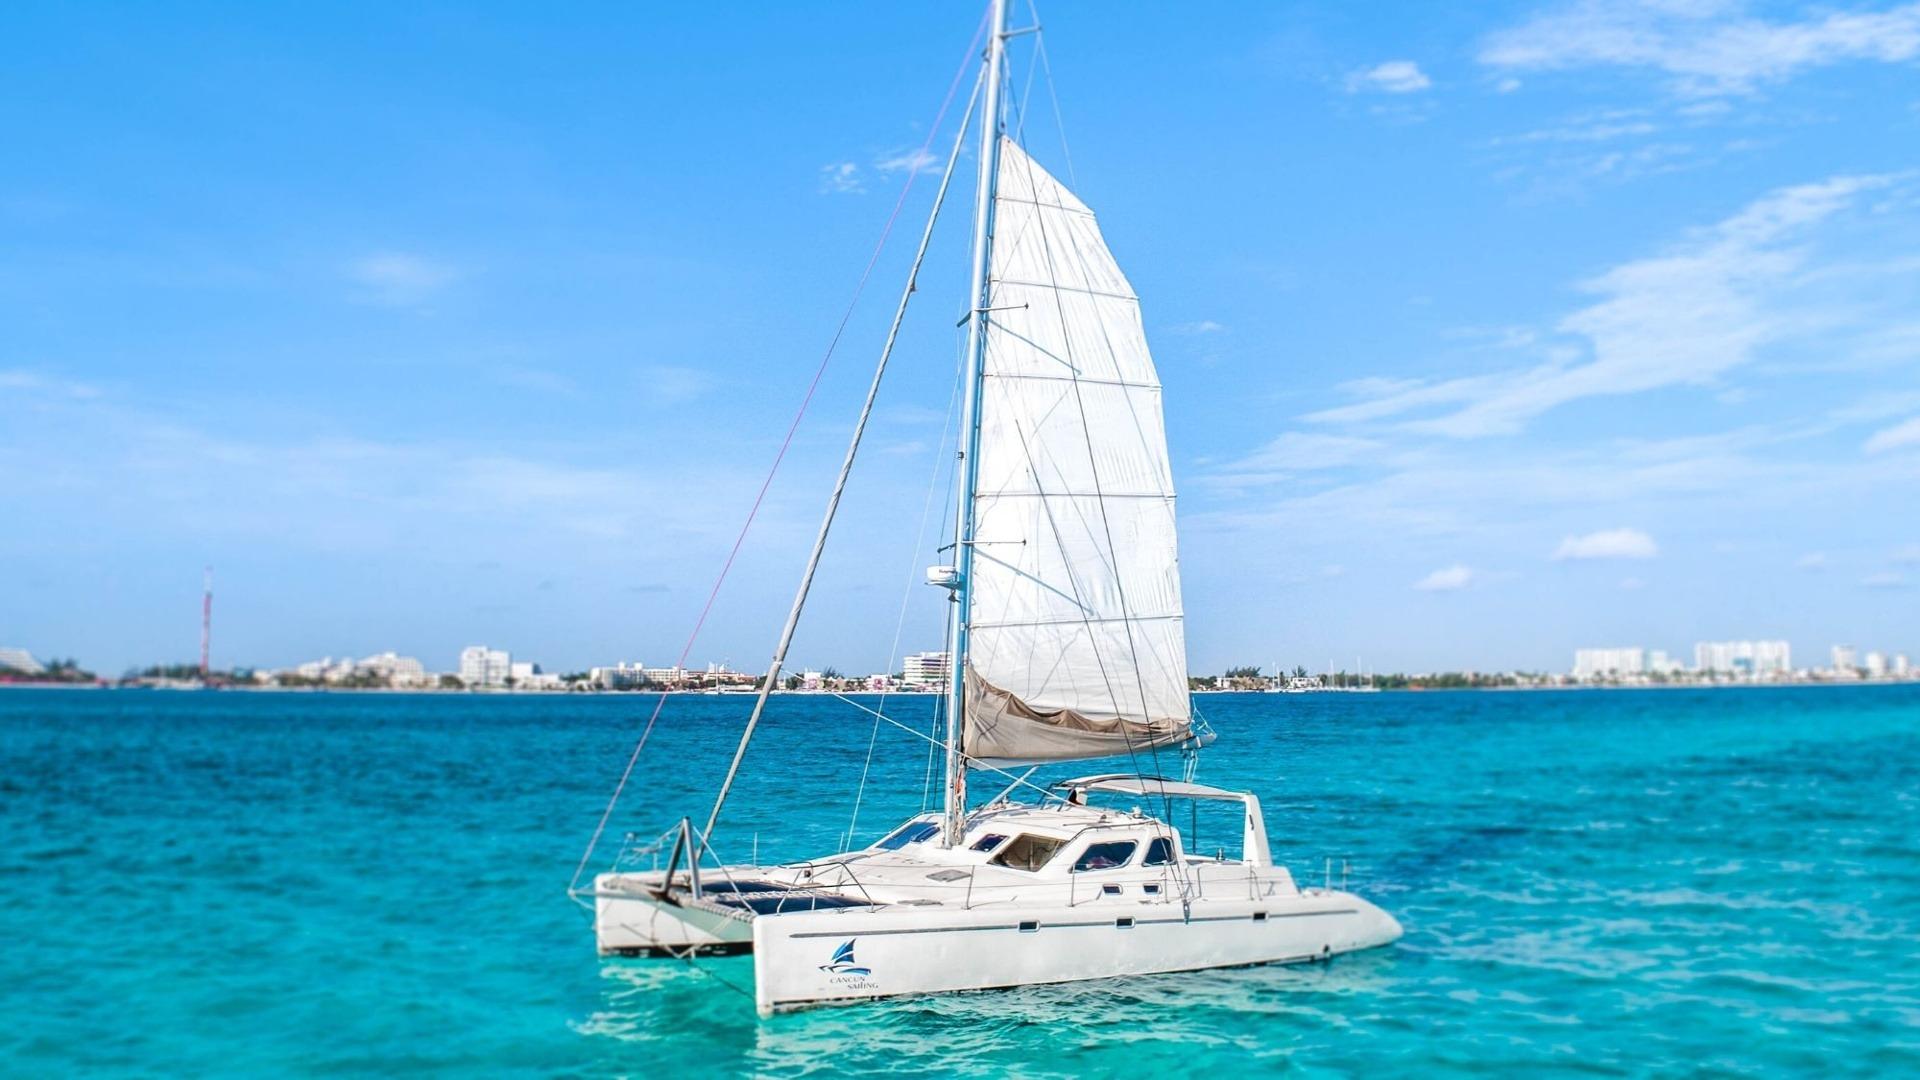 6 - LowRes - Paradise explorer - Private Isla Mujeres catamaran tour - Cancun Sailing